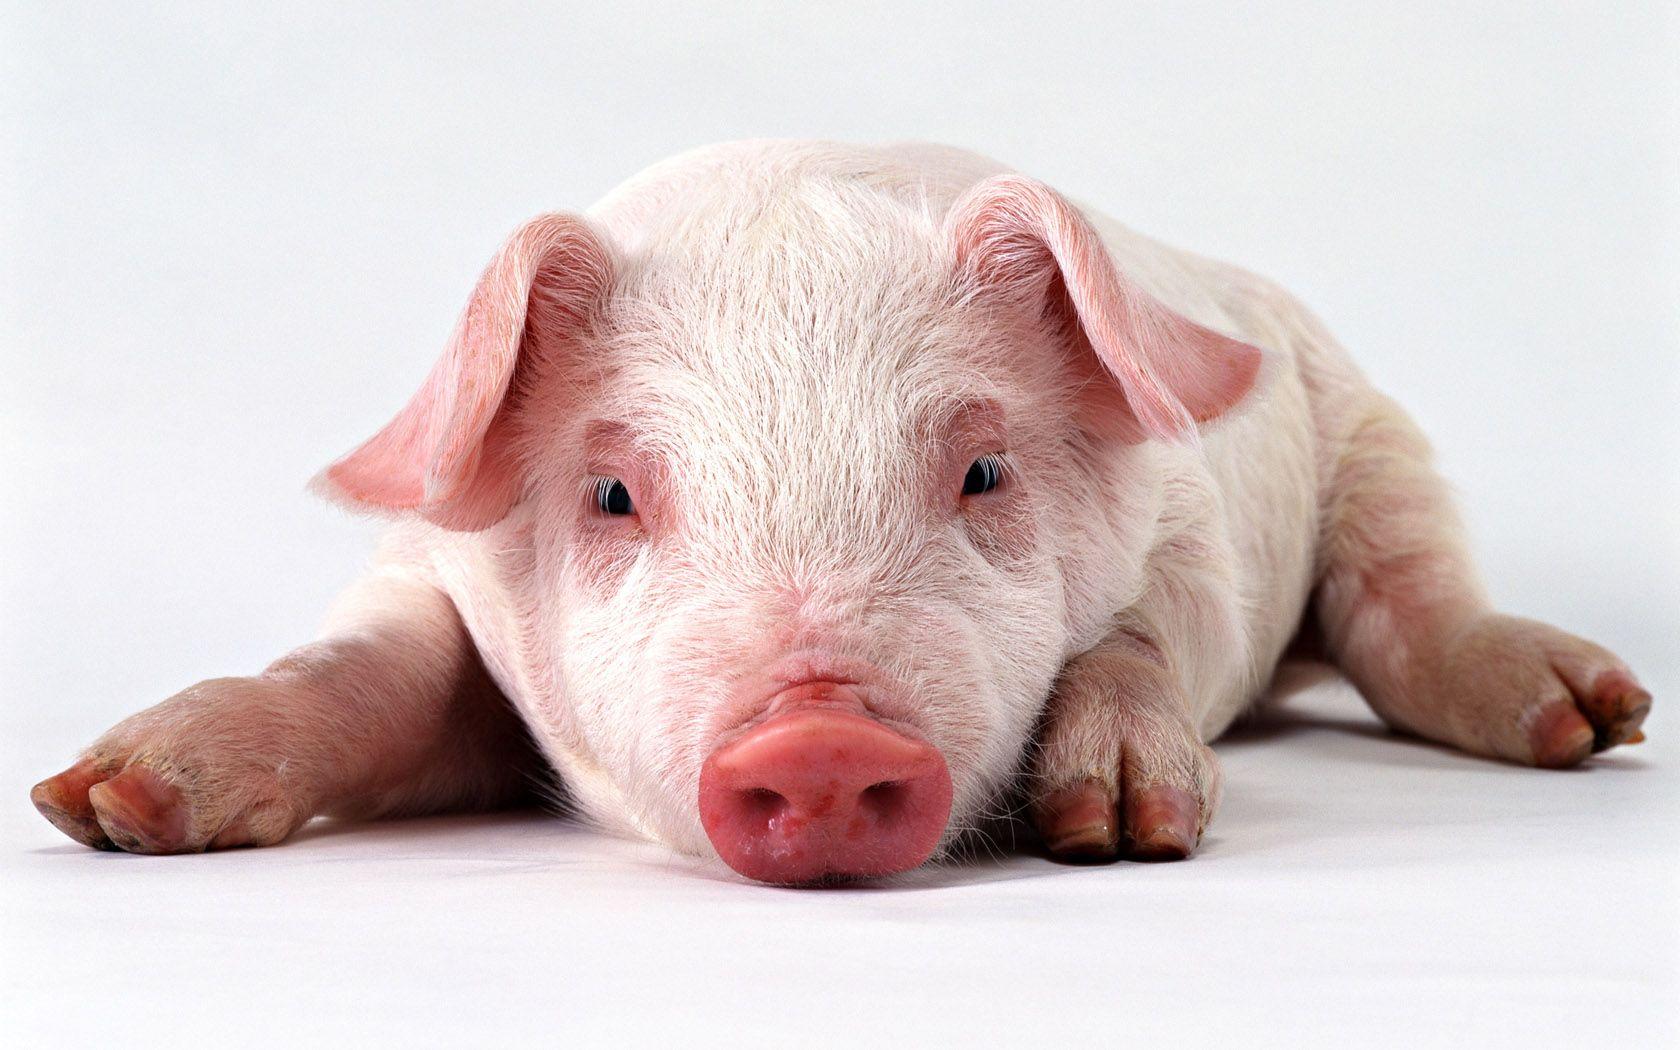 Pigs Wallpaper 1680x1050 Pigs 1680x1050